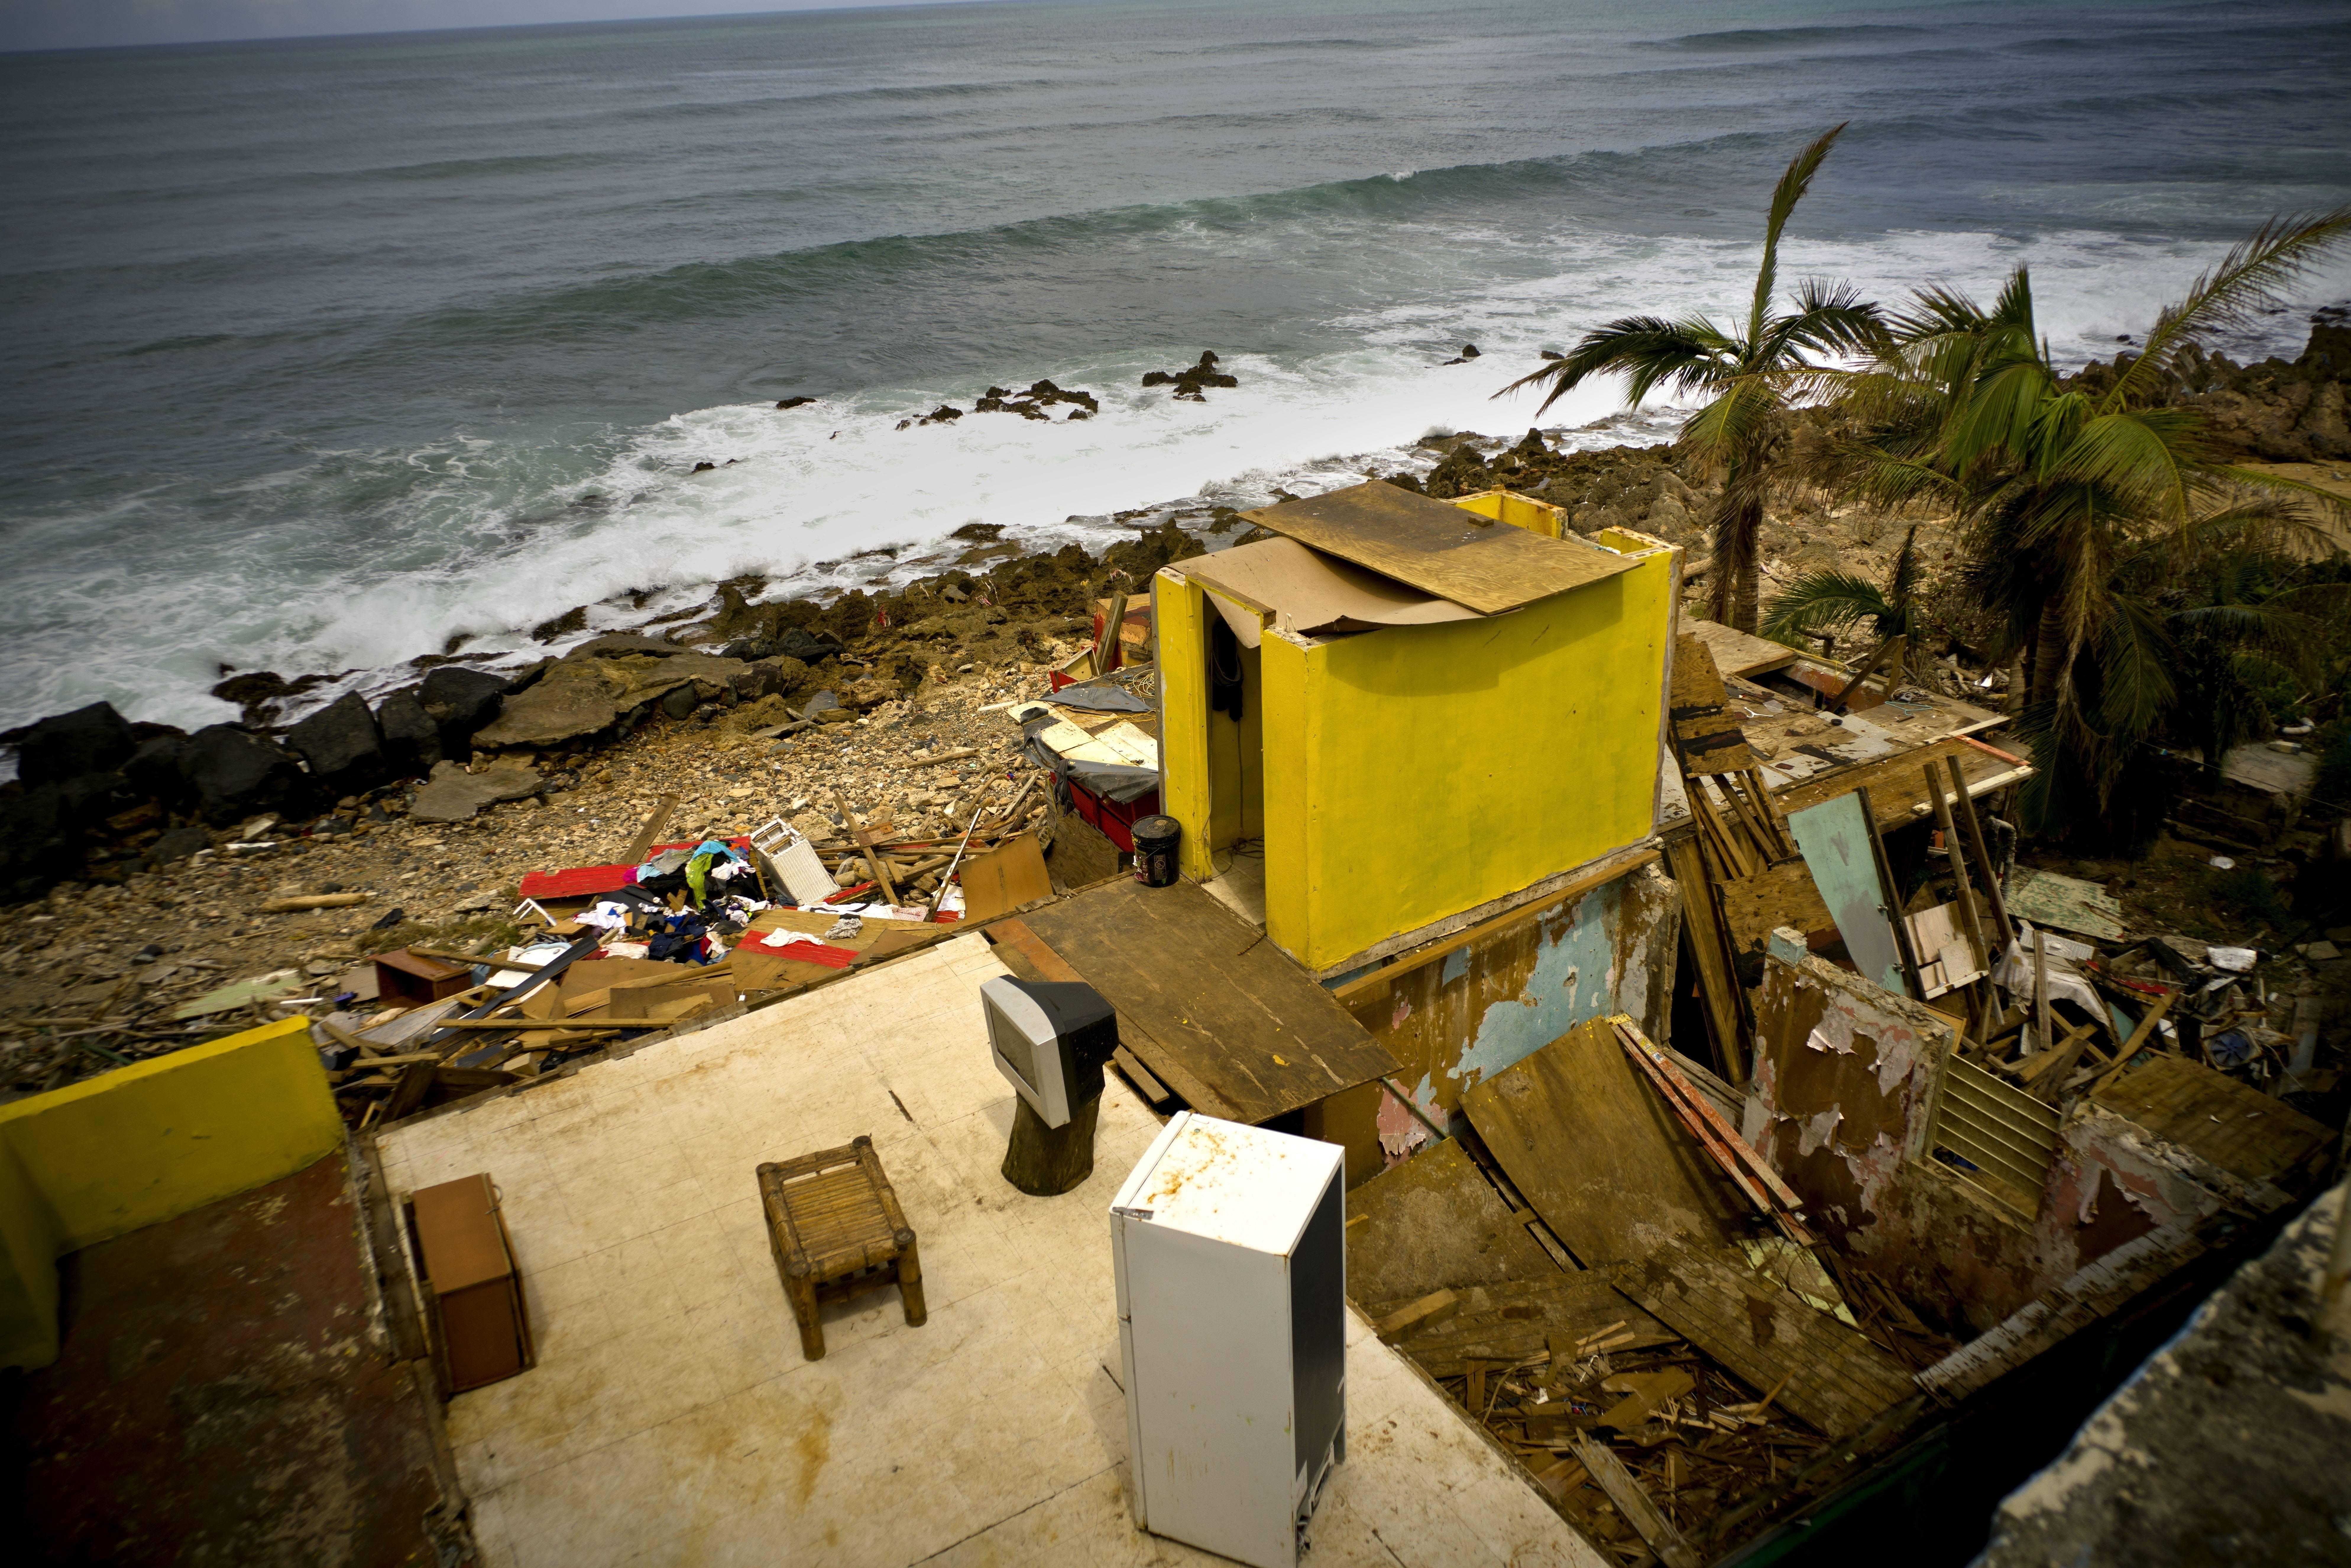 puertoricolaperlapuer-edd401c6a1072cff0ccaba7efc111bb2.jpg